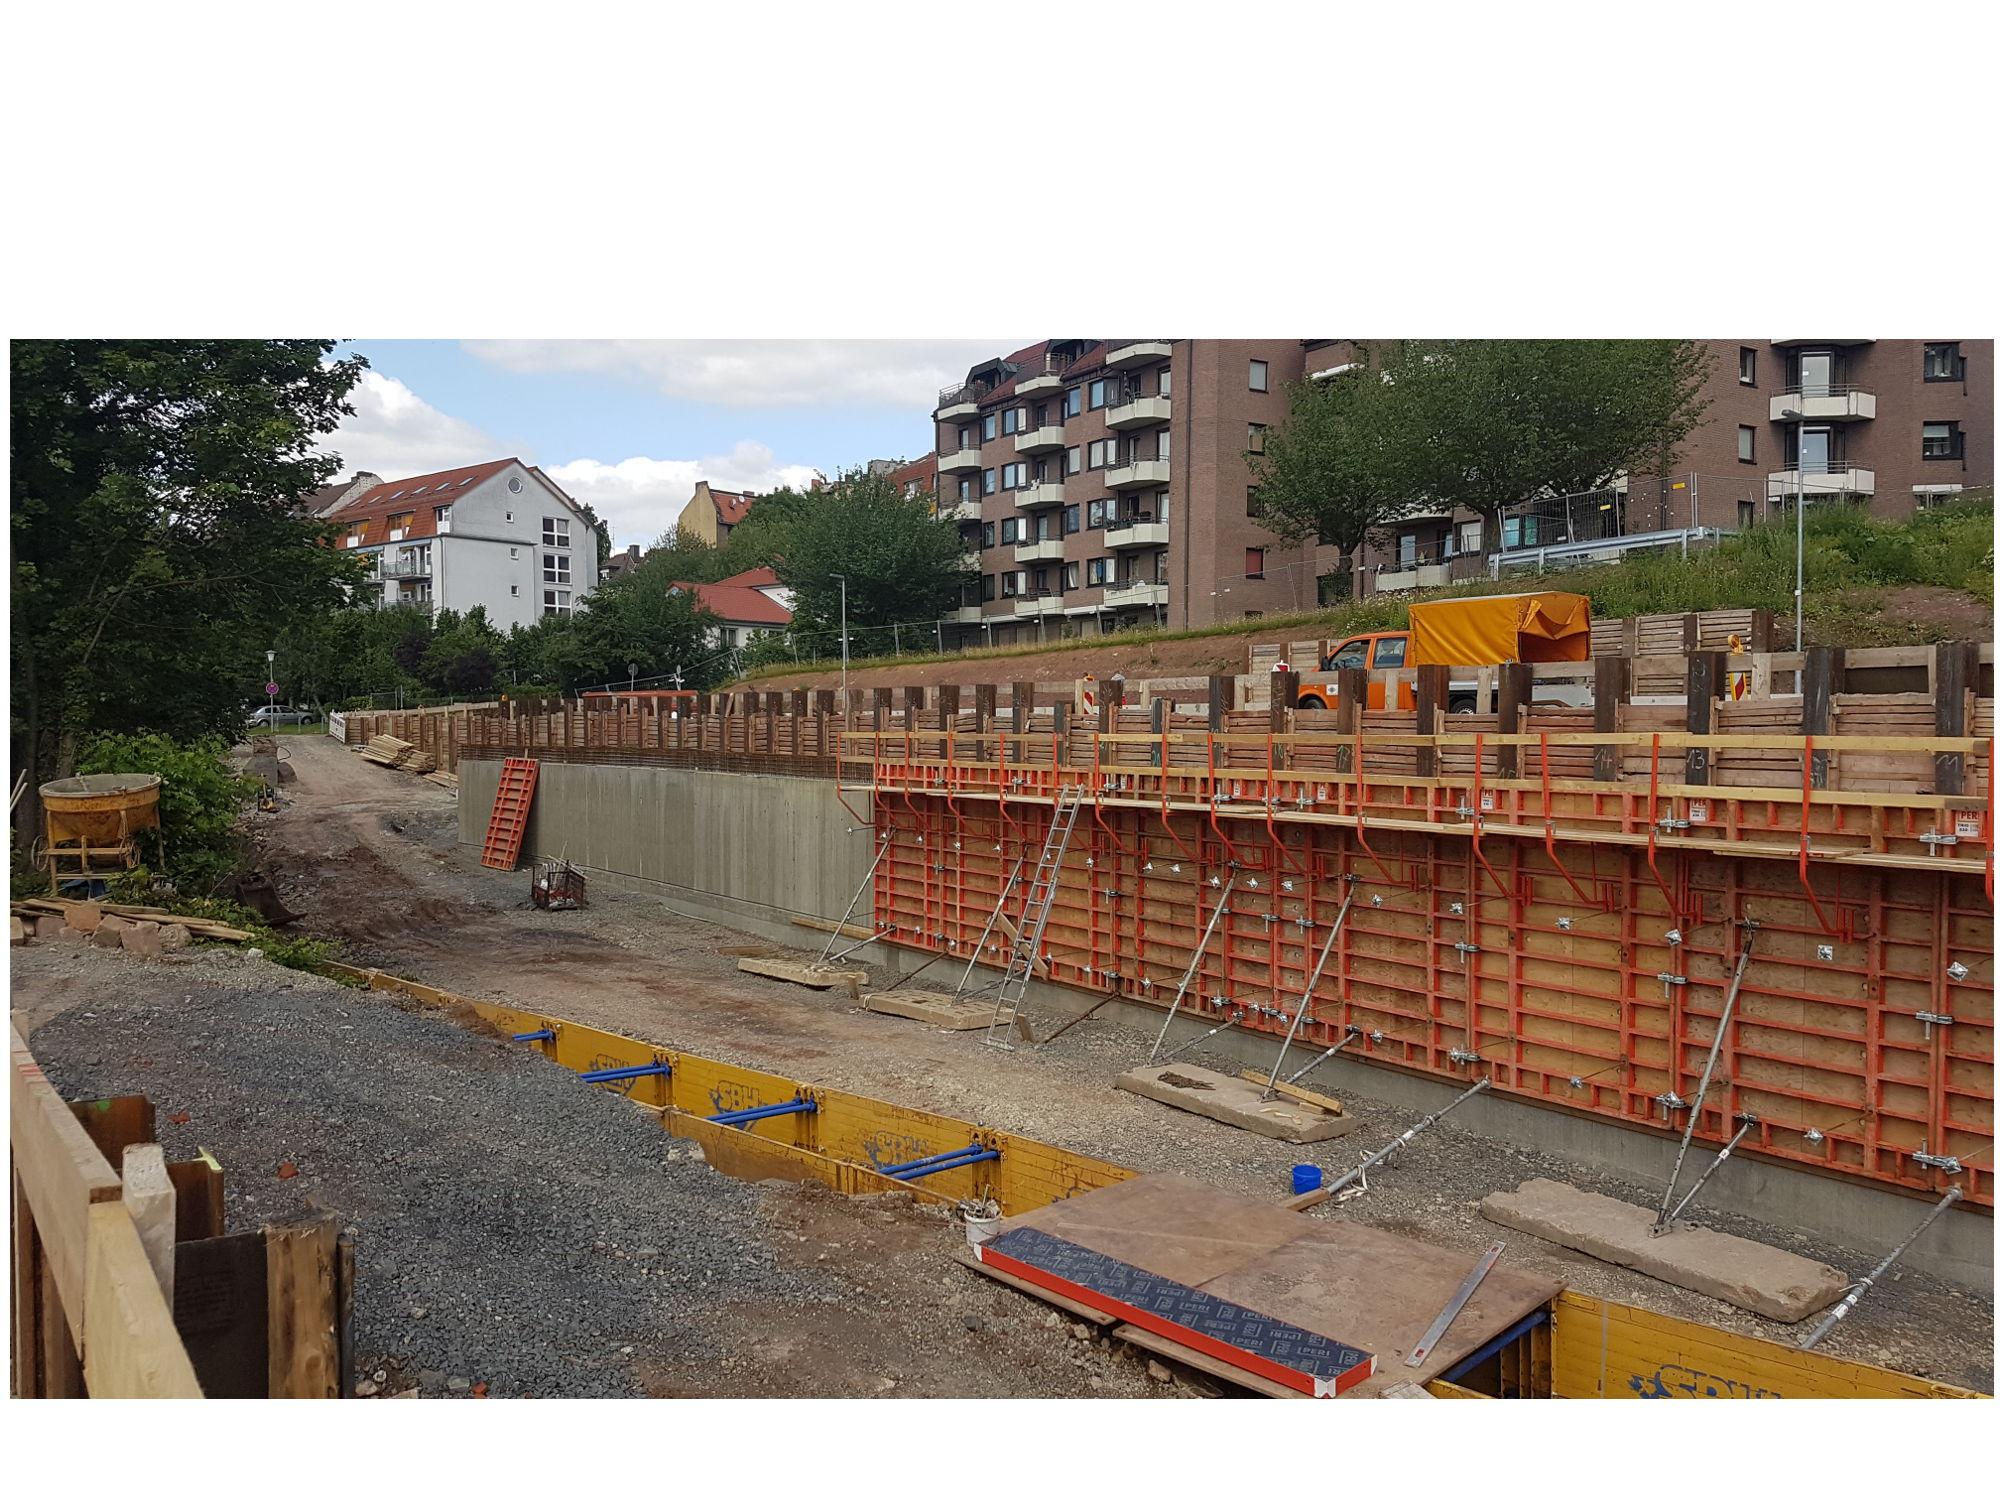 Stützwand-Ahna-Kassel-Aug.-17-2